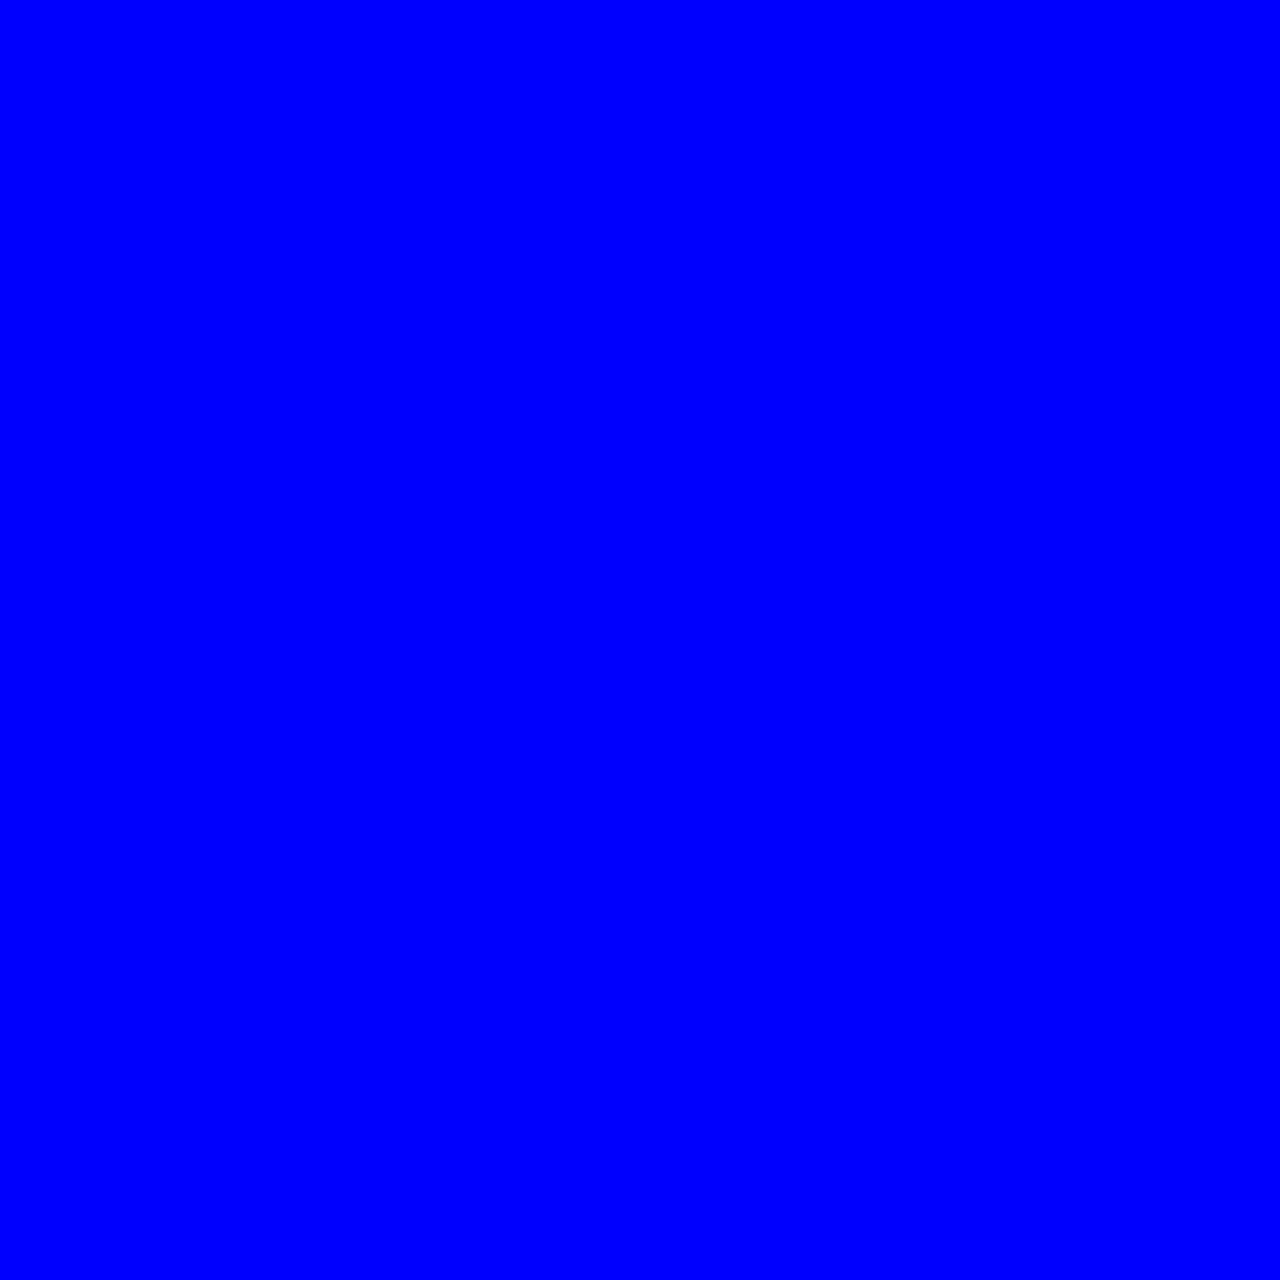 Blue Lollies